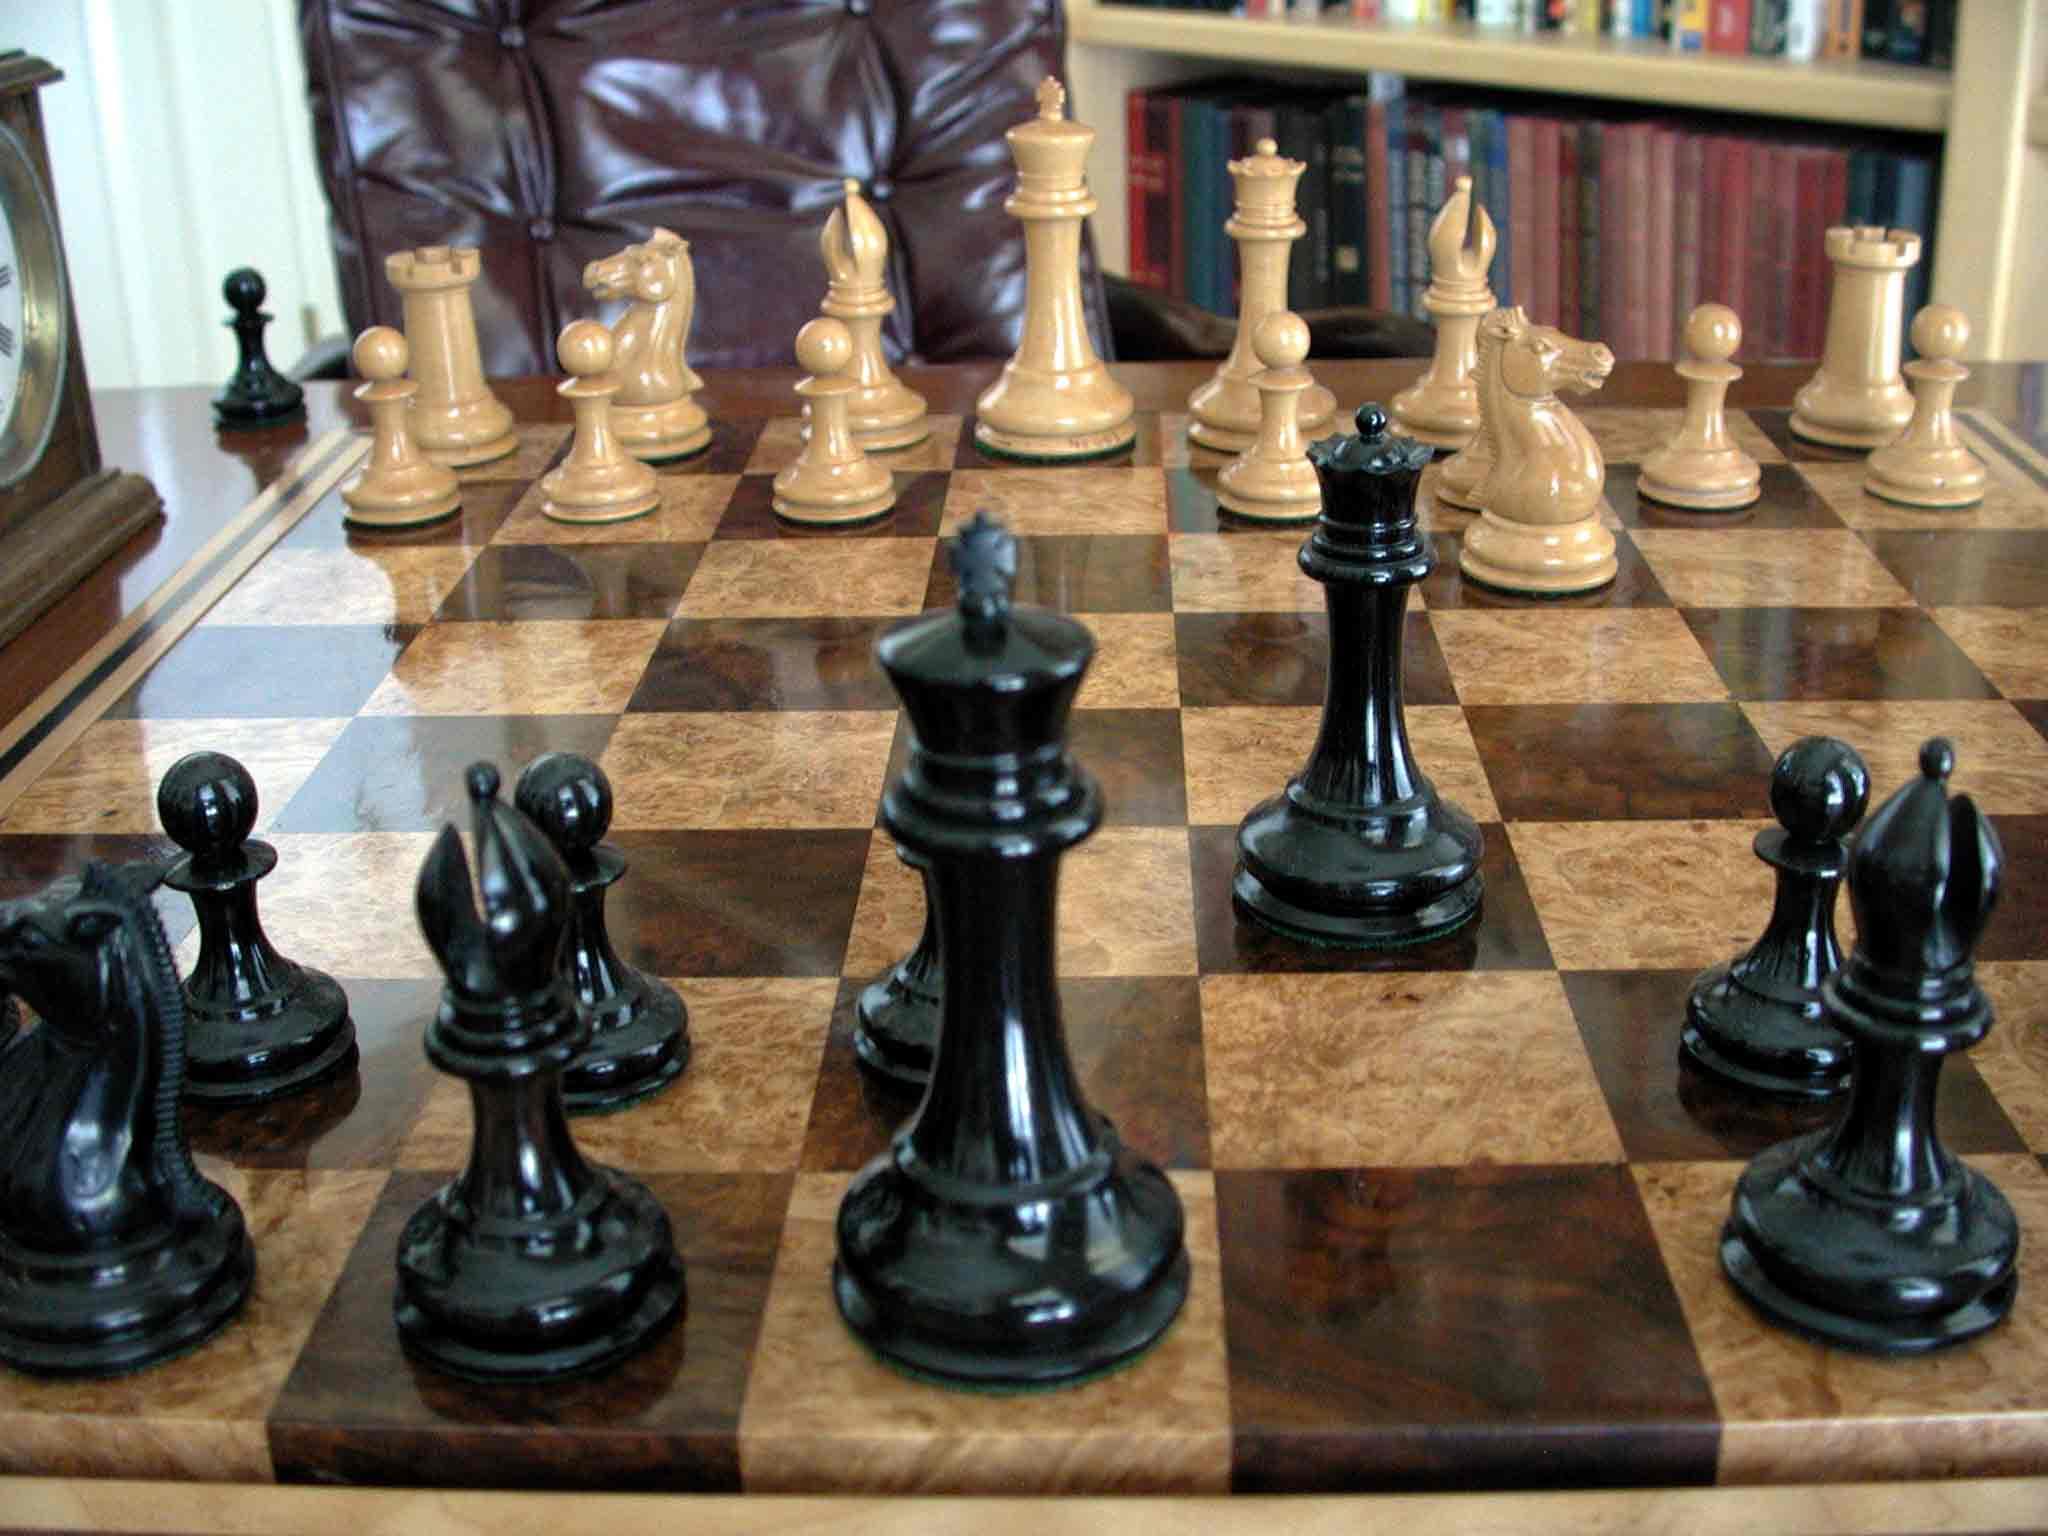 House of Staunton Chessmen